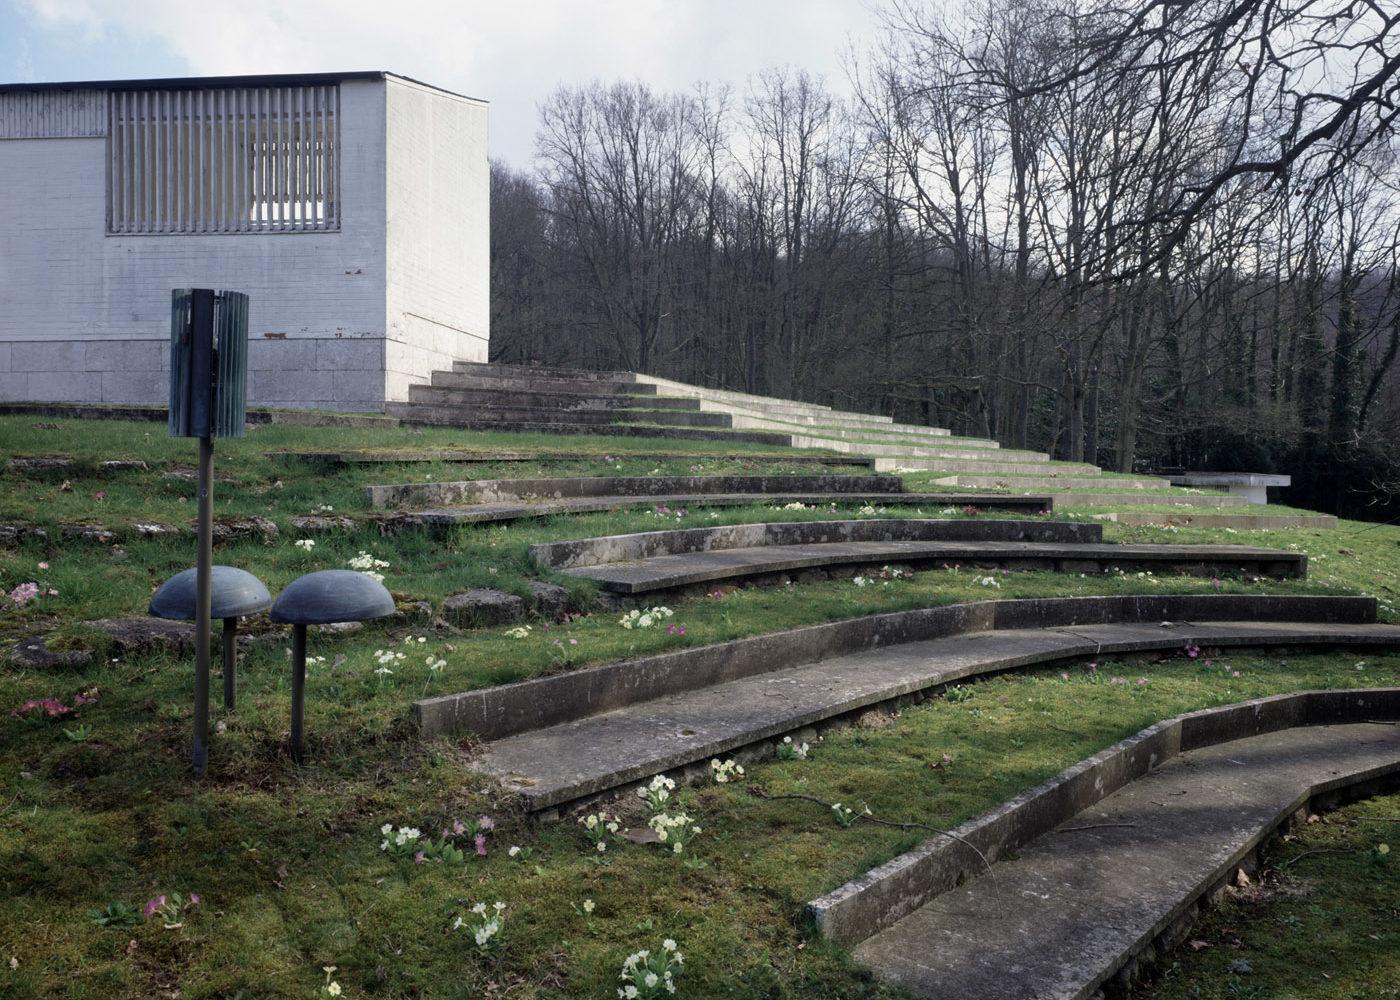 Maison Louis Carré garden